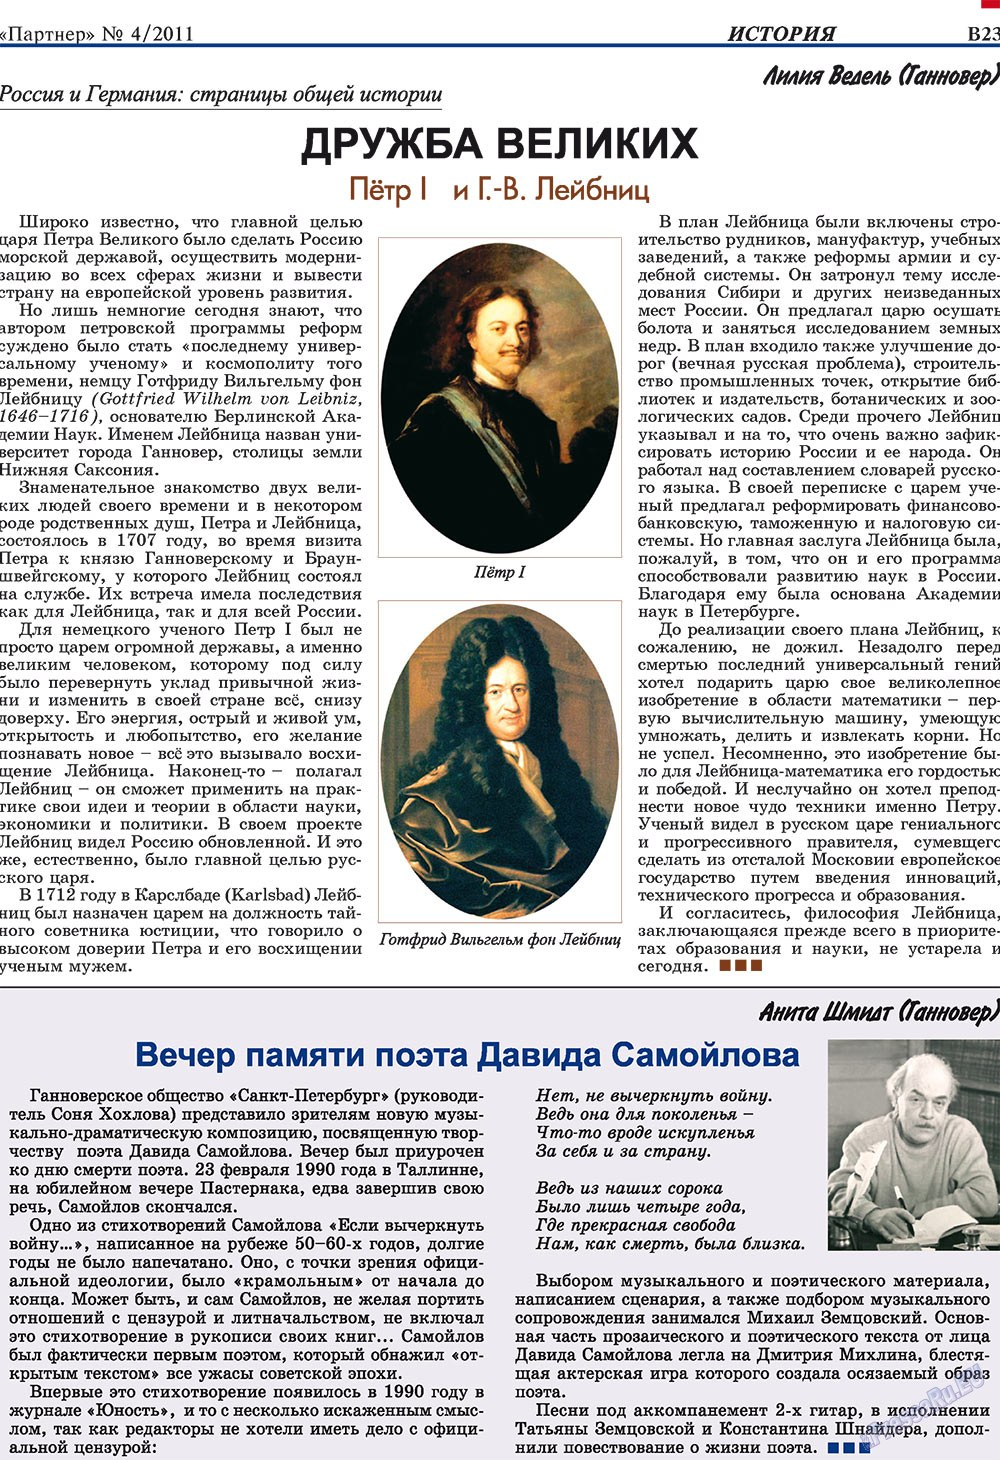 Партнер-север (журнал). 2011 год, номер 4, стр. 33